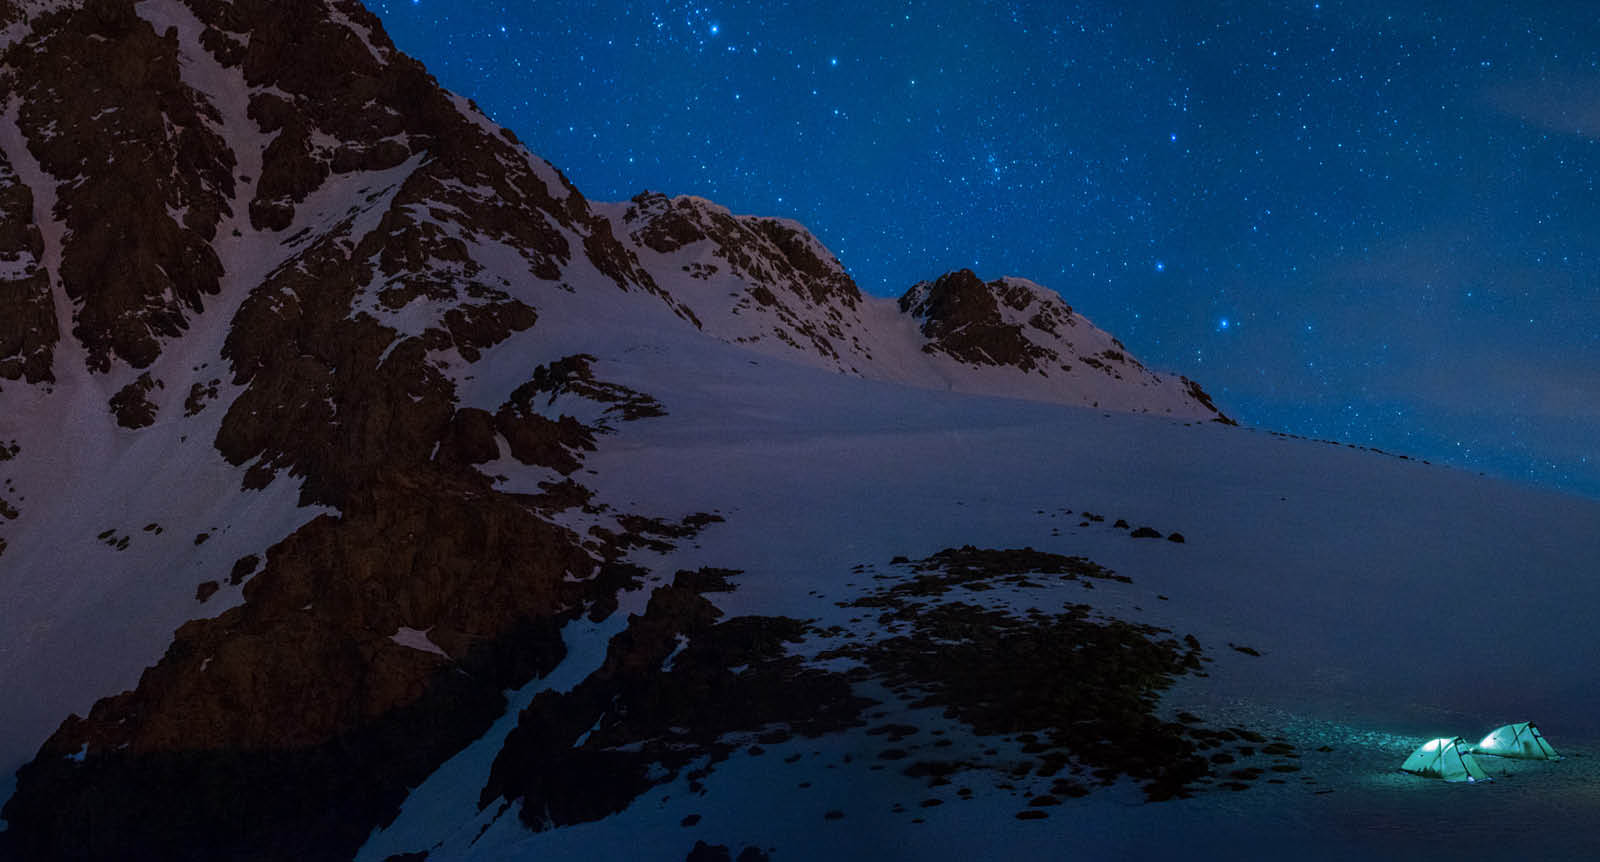 Kurdistan trekking. Camping under the stars